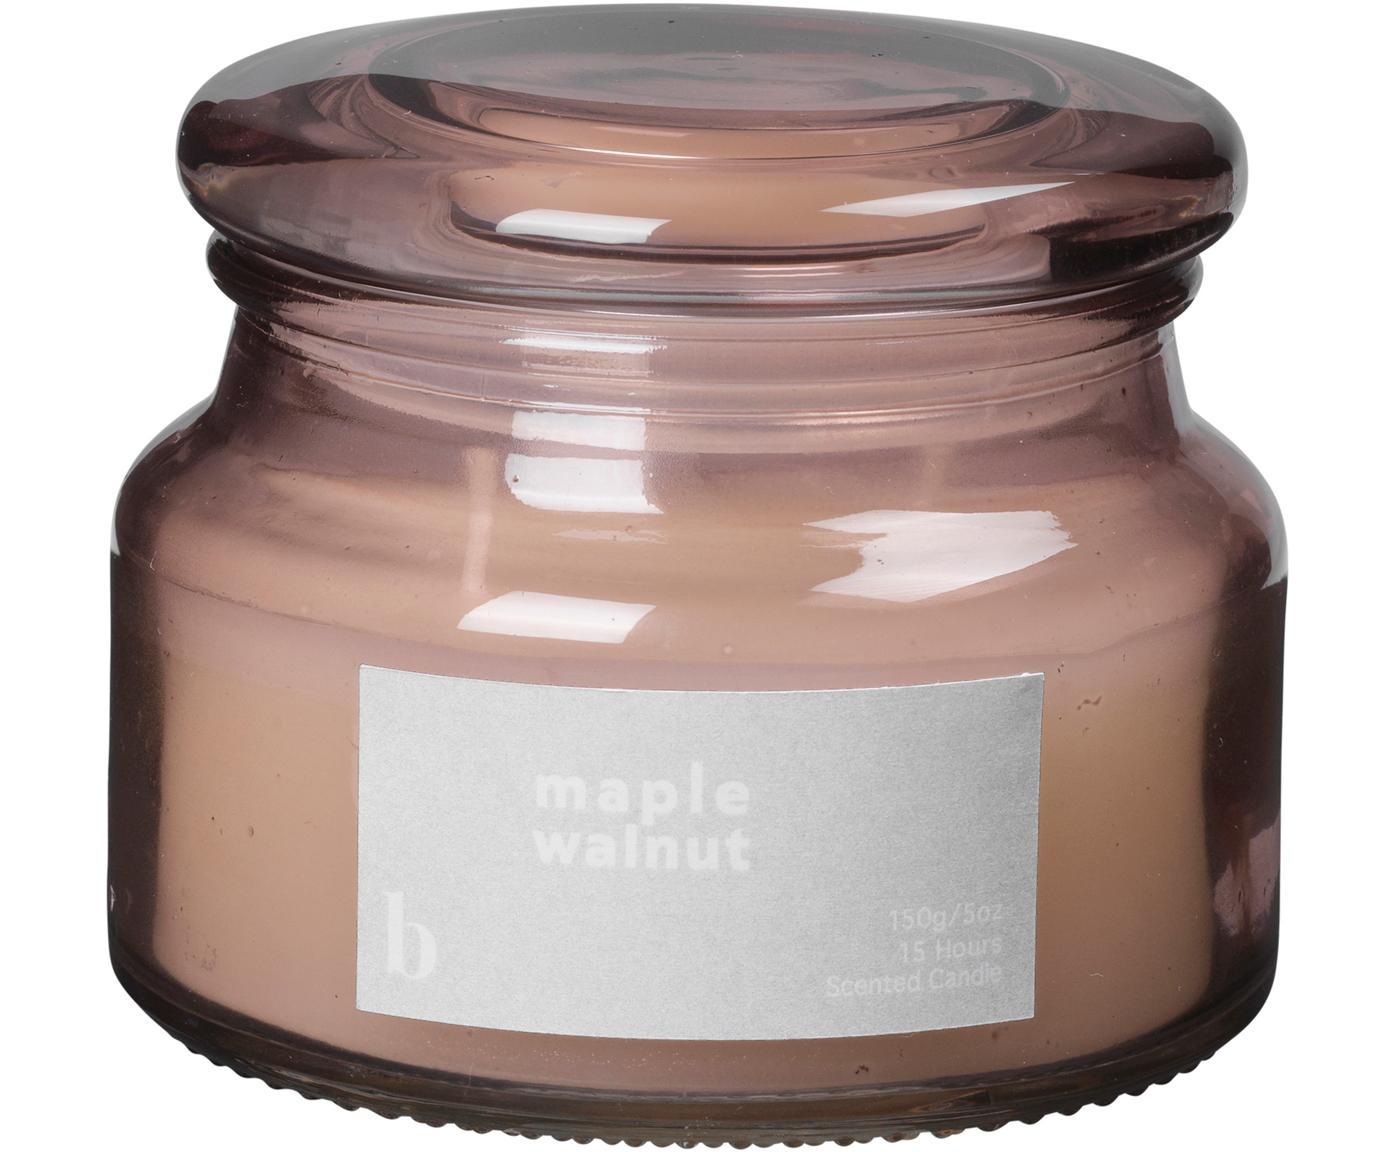 Duftkerze Maple Walnut, Behälter: Glas, Altrosa, Ø 10 x H 8 cm